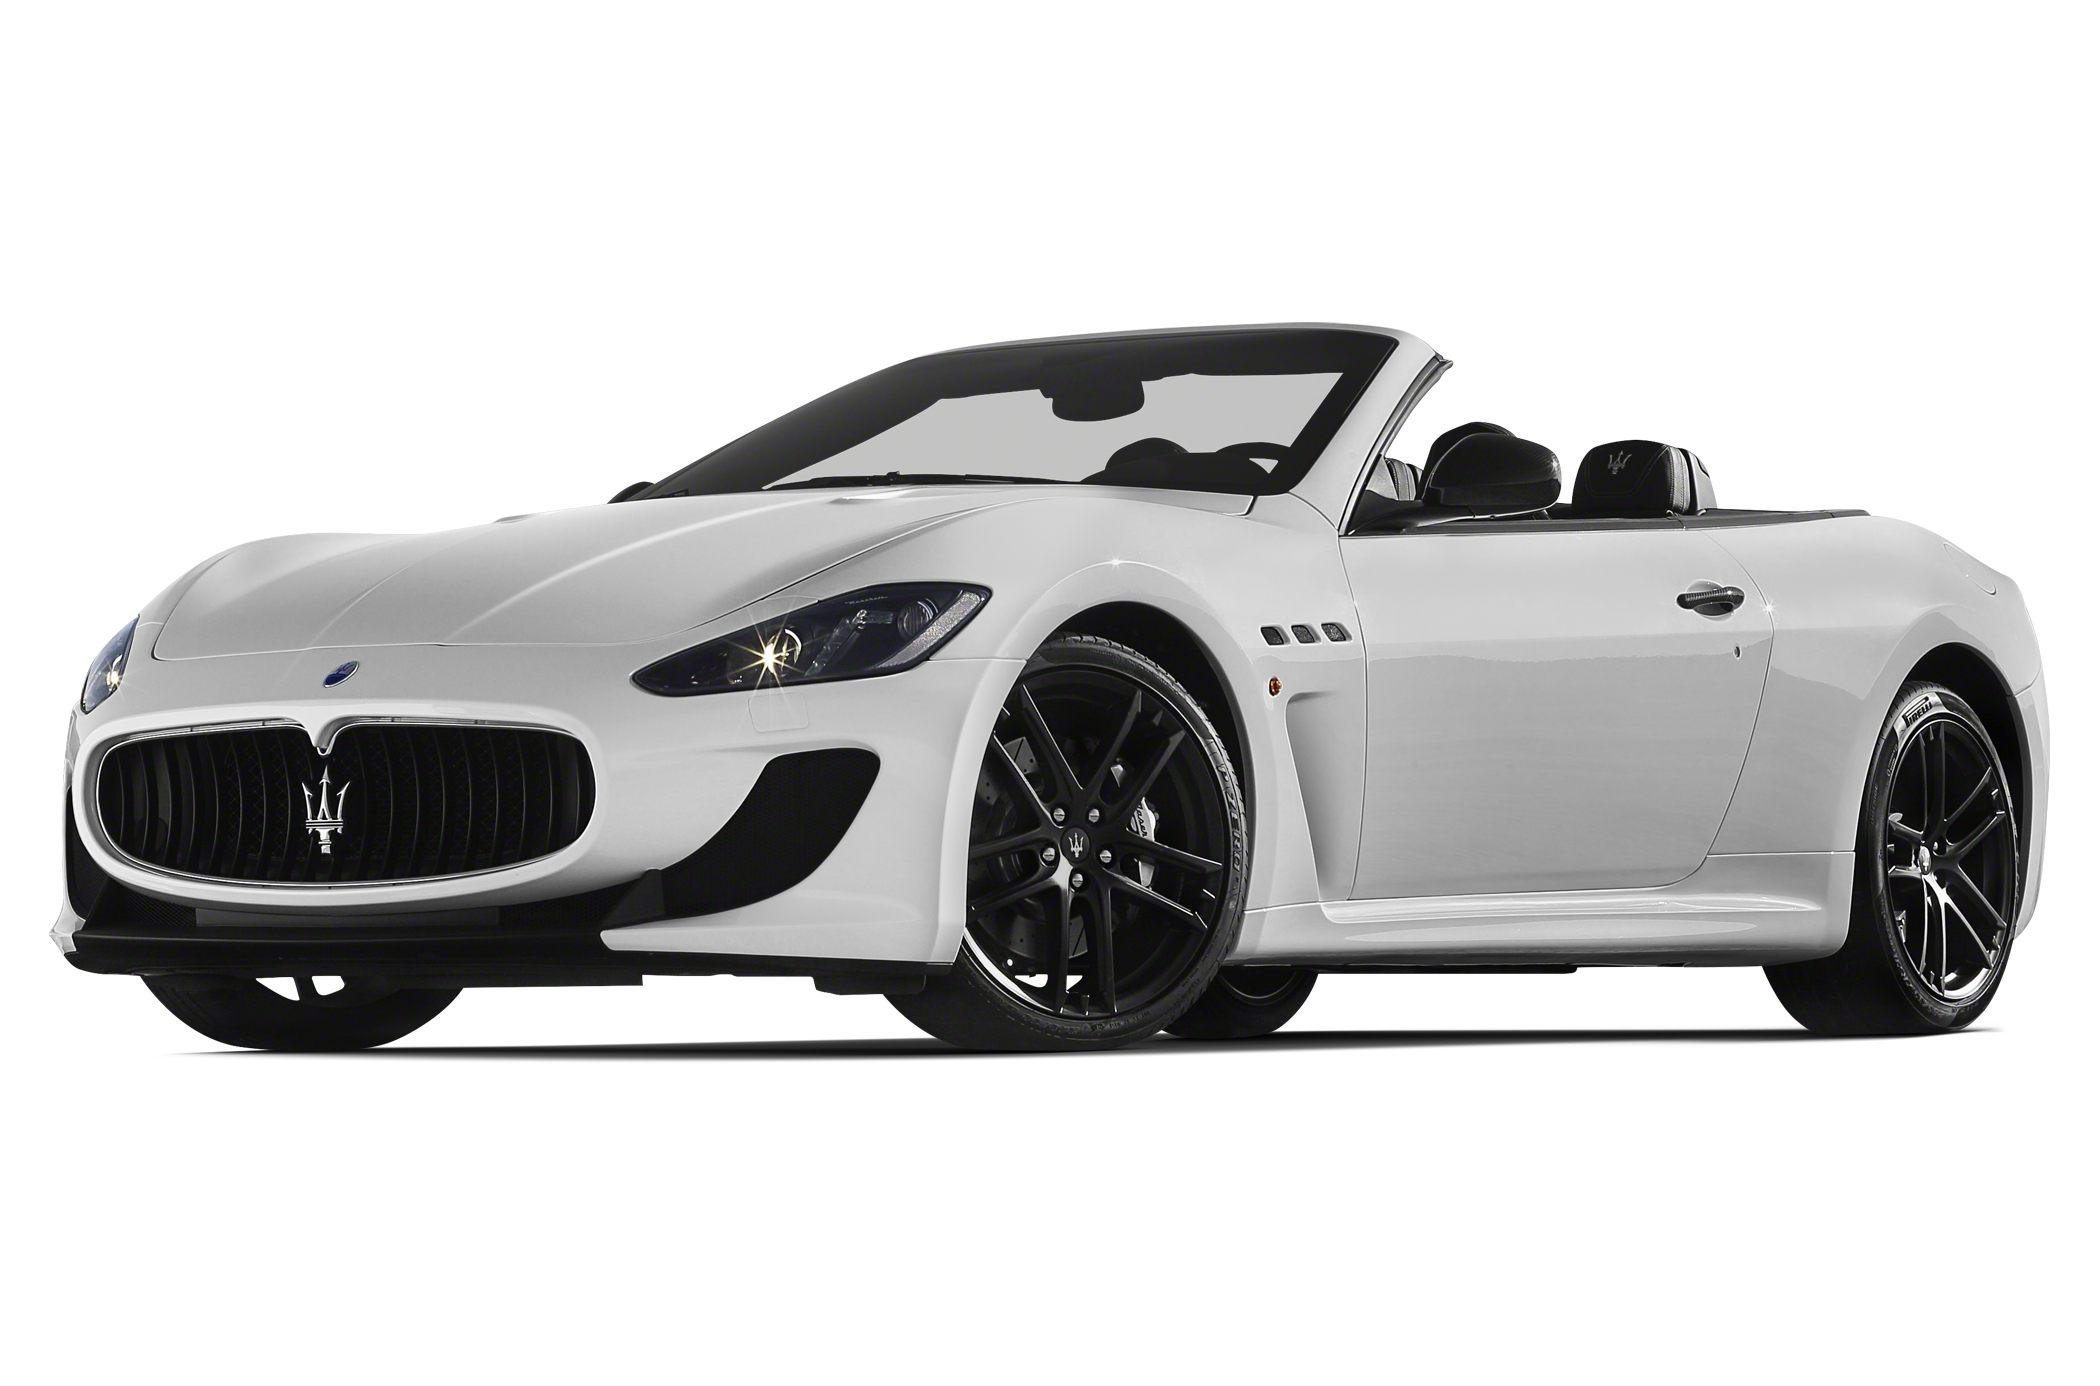 2016 Maserati Granturismo Mc 2dr Convertible Pricing And Options